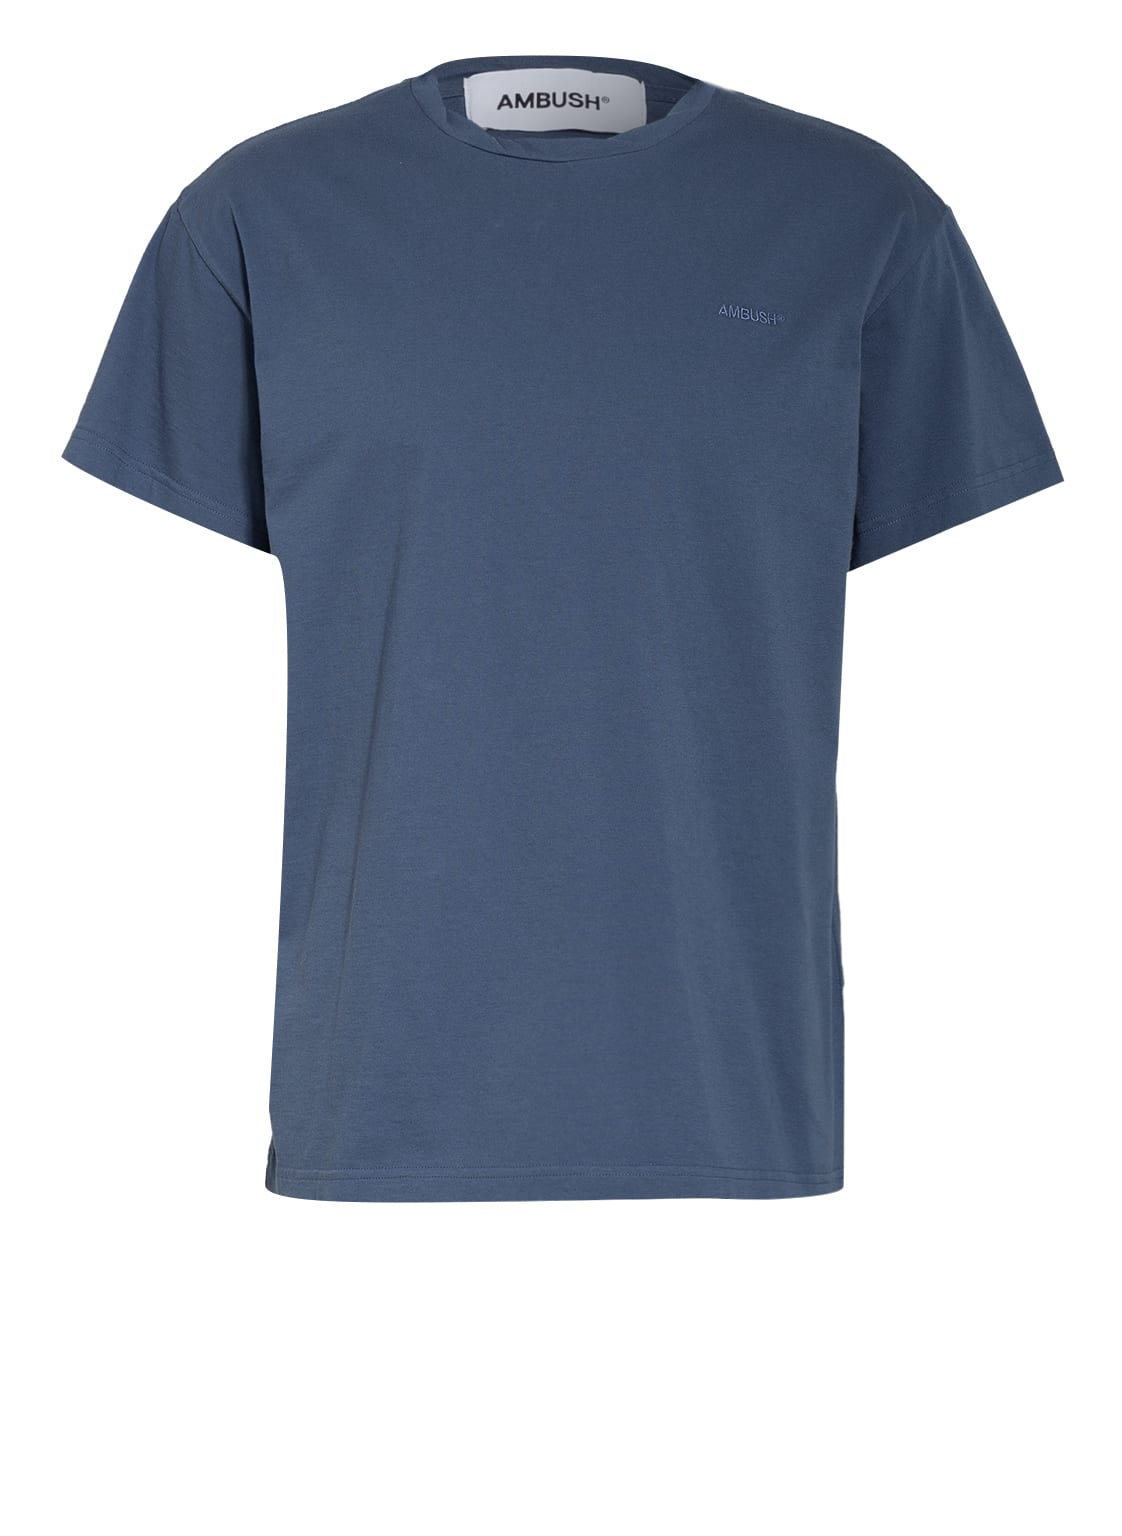 Image of Ambush T-Shirt blau